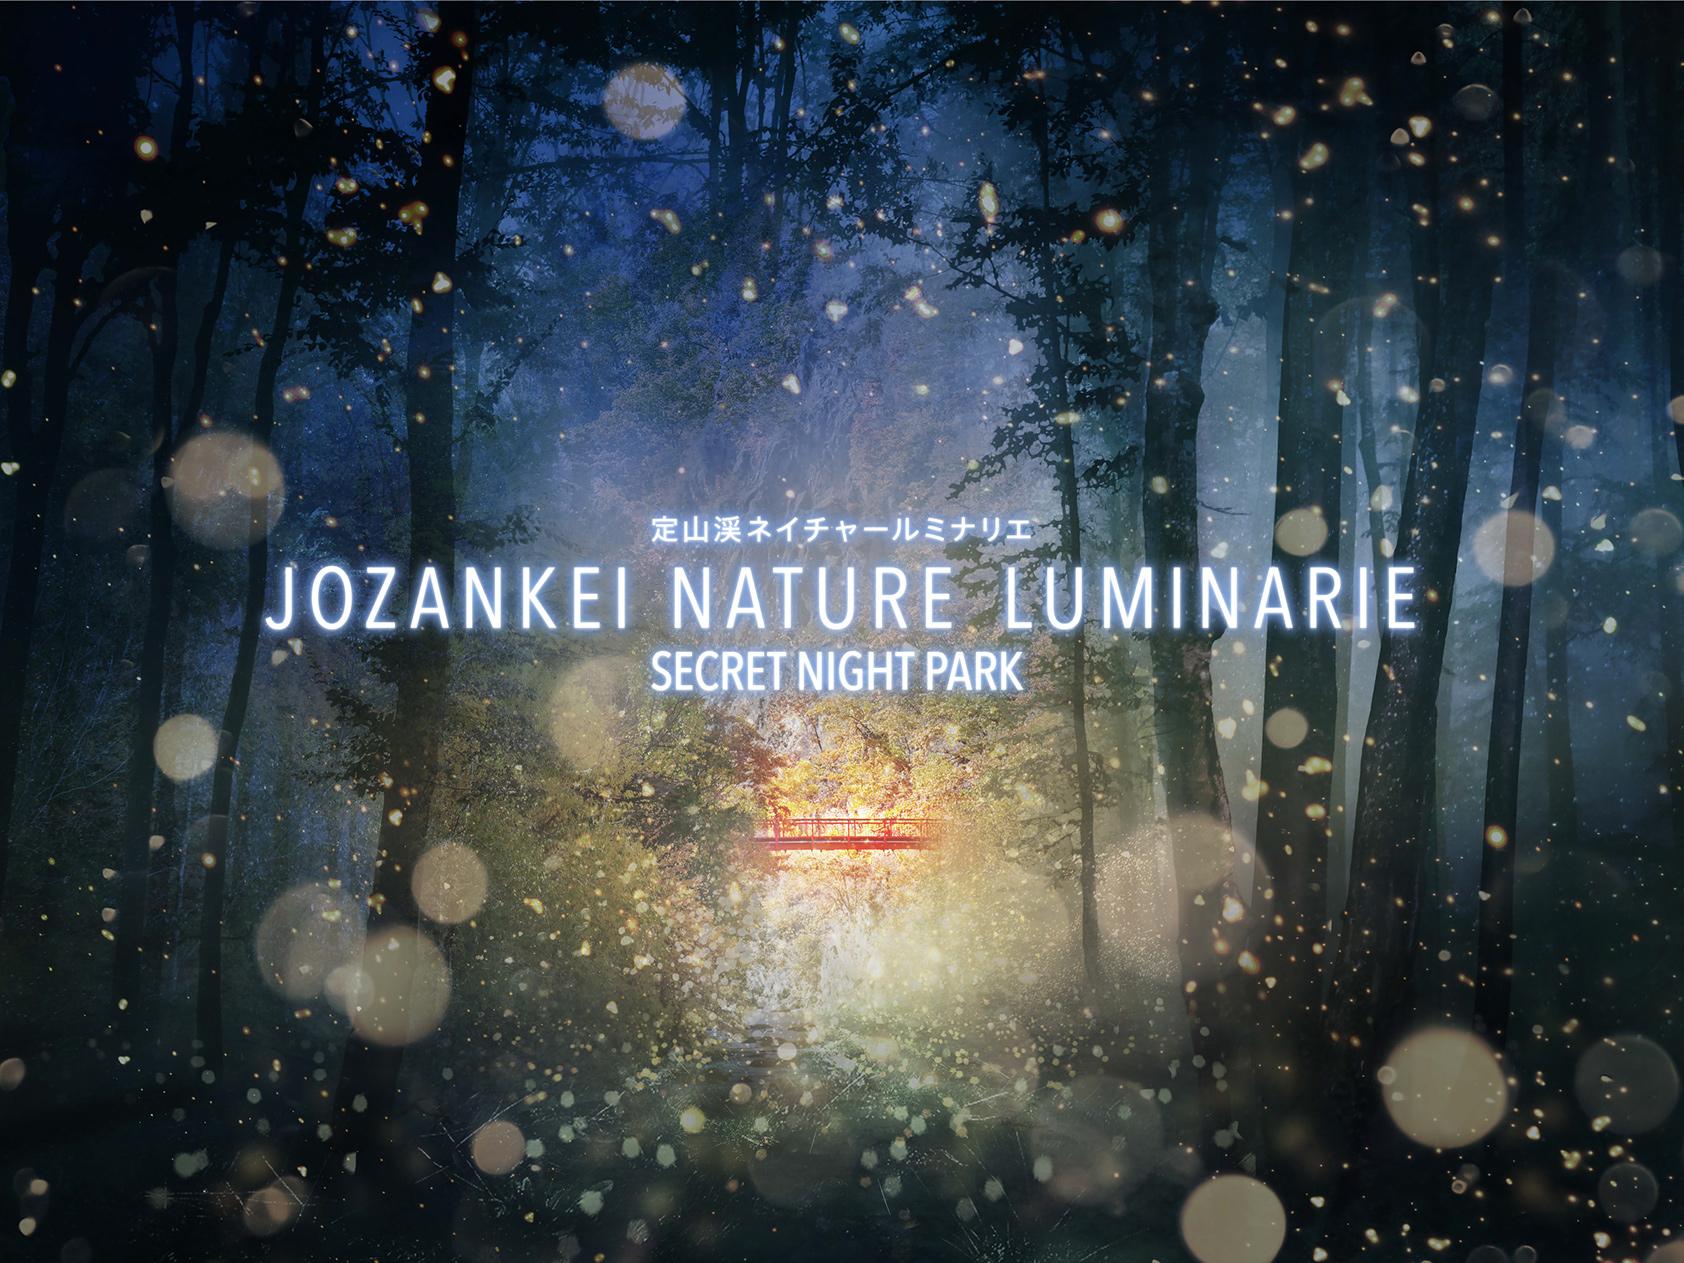 NAKEDの没入型ナイトパーク 北海道の大自然を光と映像で演出